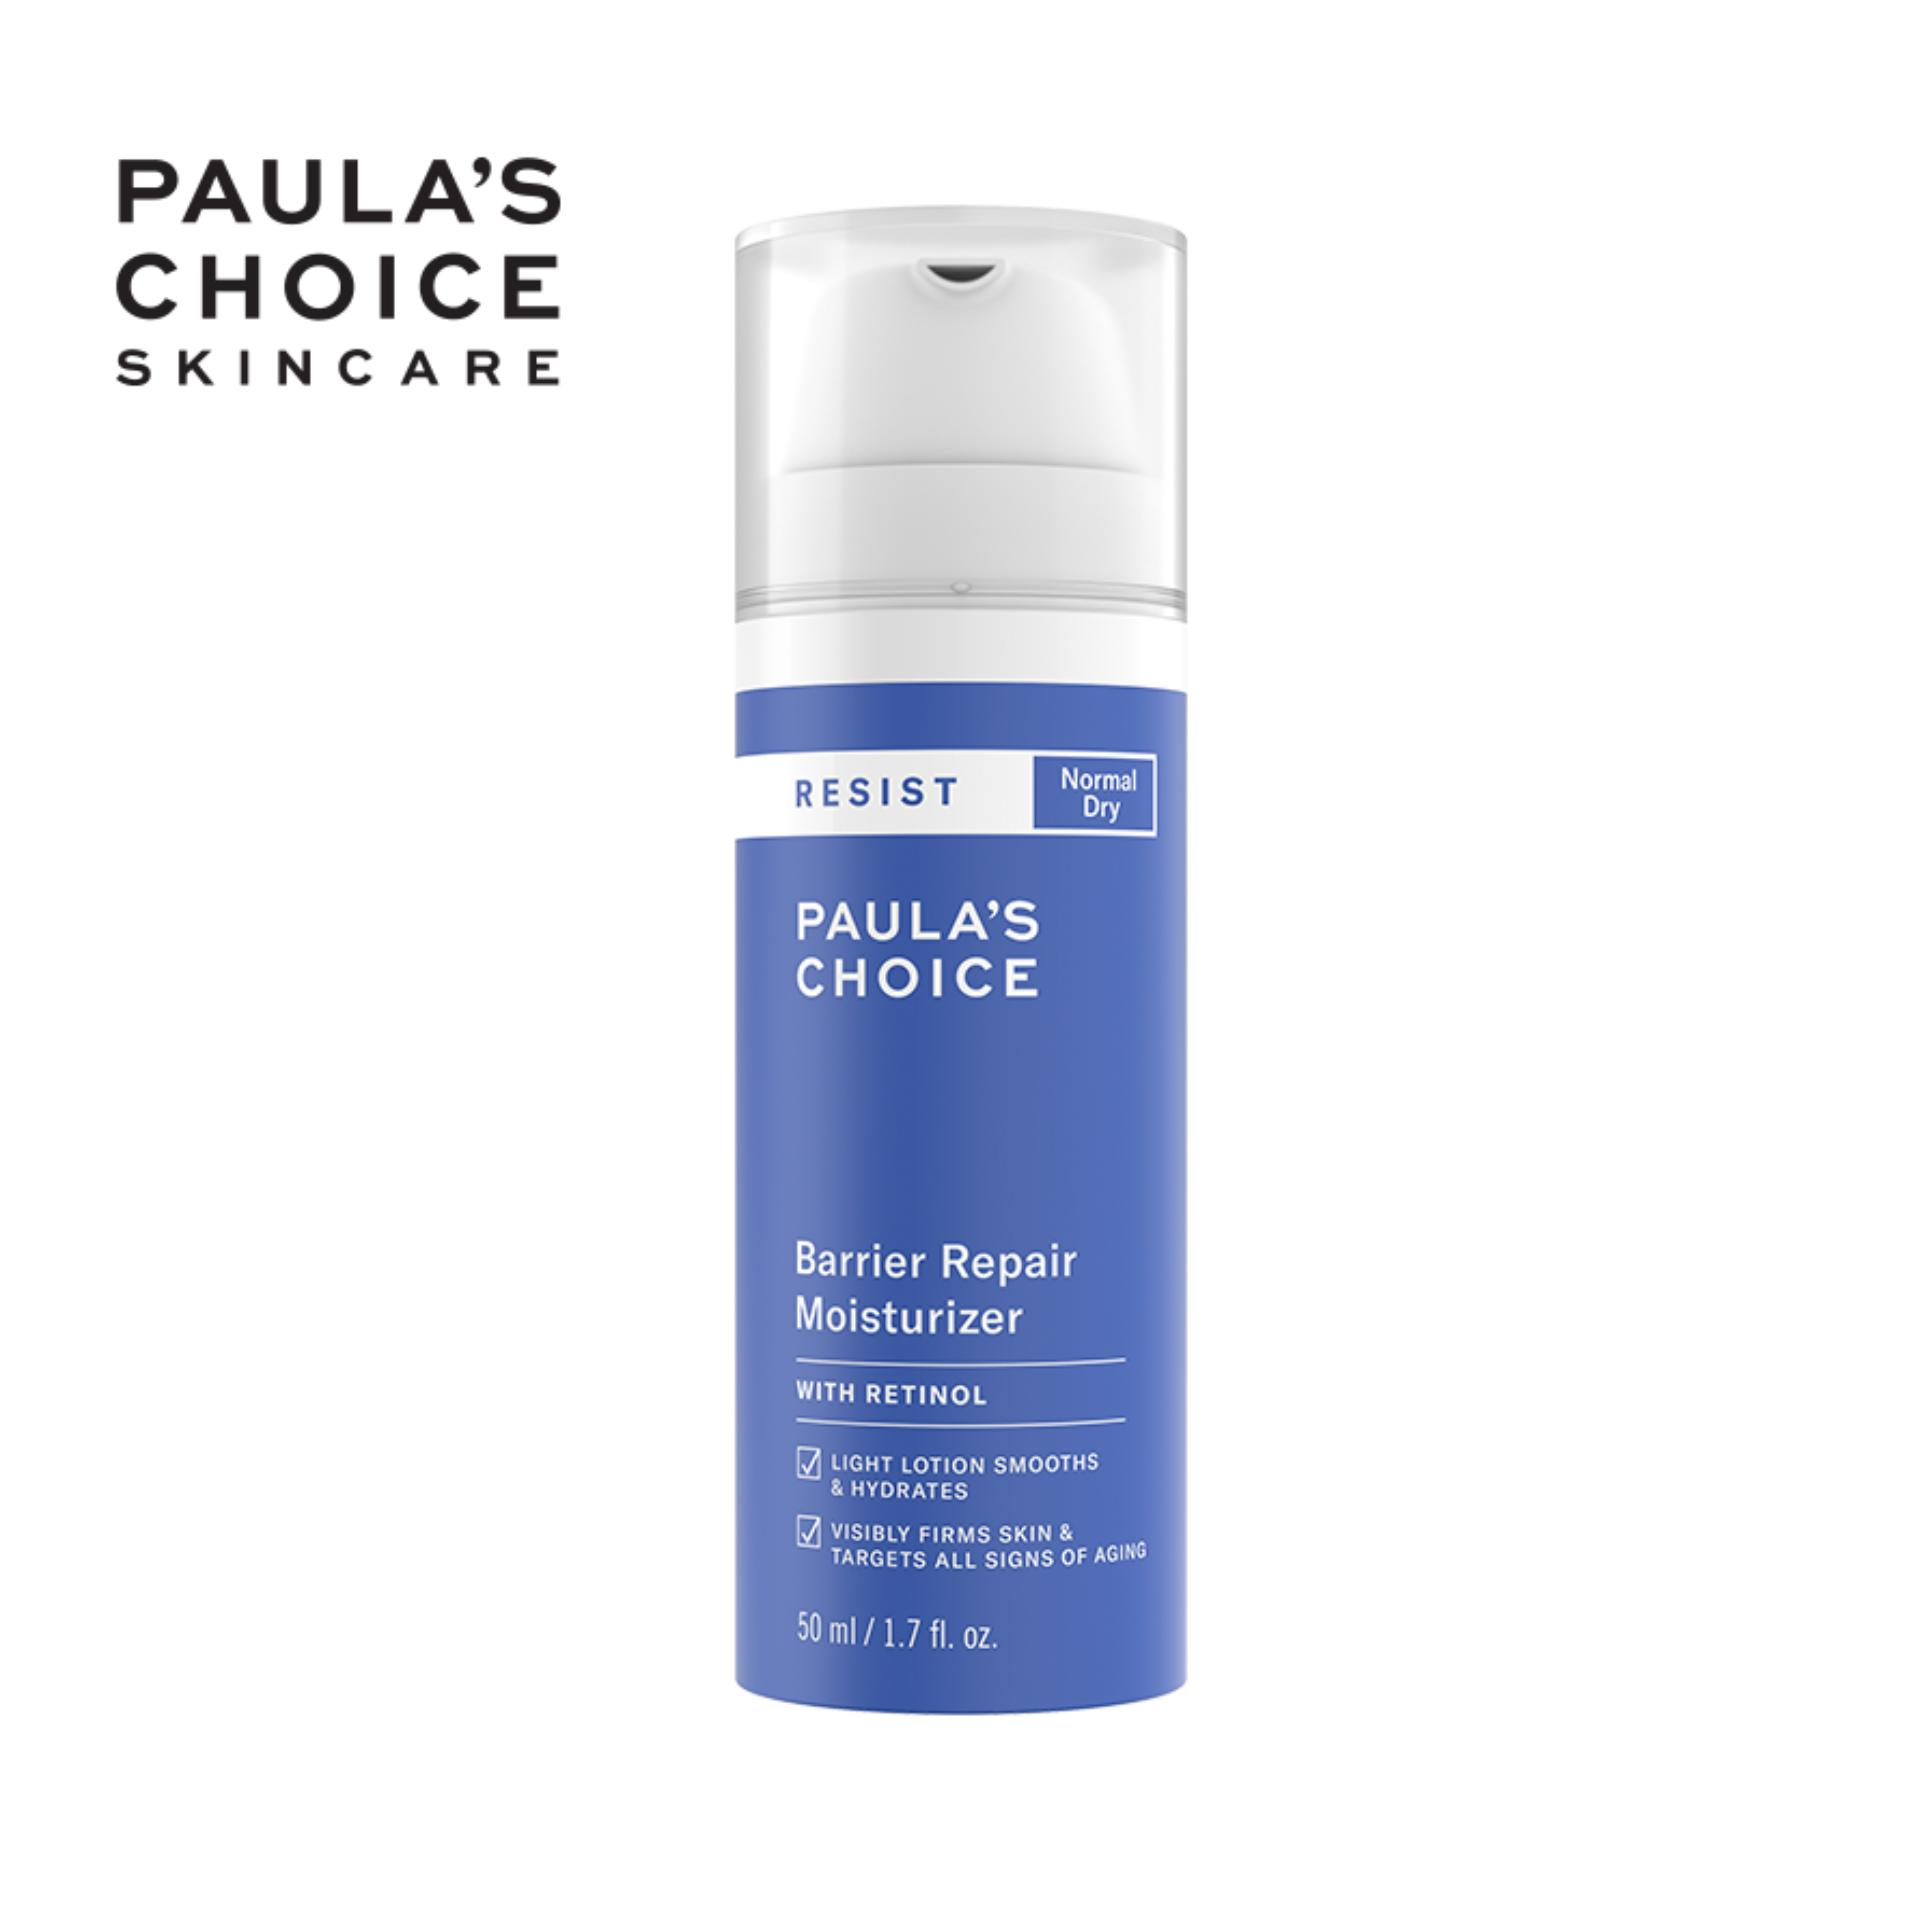 Kem dưỡng tái tạo da chống lão hóa Paula's Choice Resist Barrier Repair Moisturizer Skin Remodeling 7610